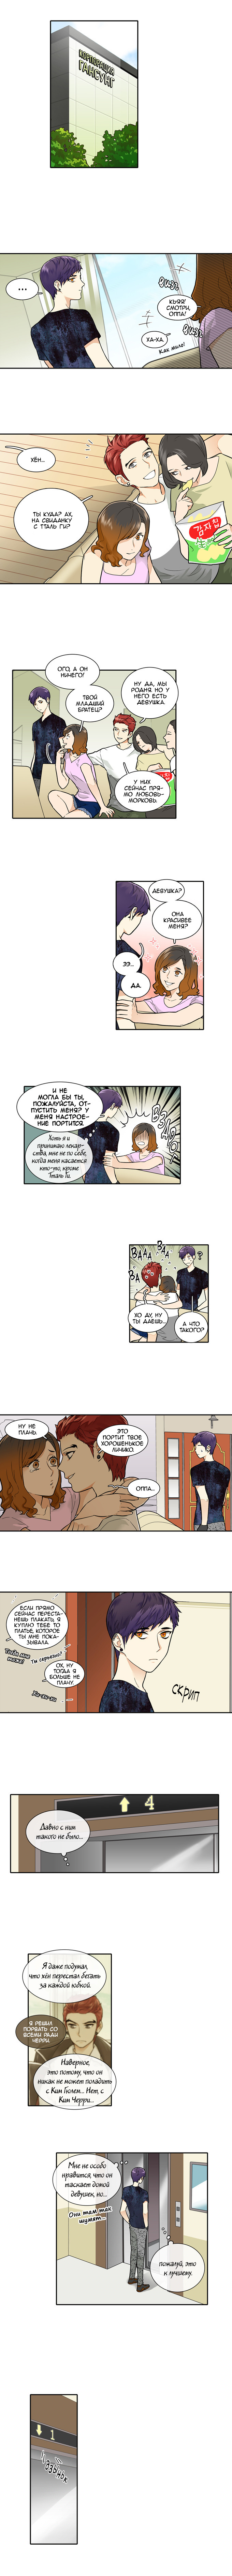 https://r1.ninemanga.com/comics/pic2/41/21609/270187/1438585511250.jpg Page 4